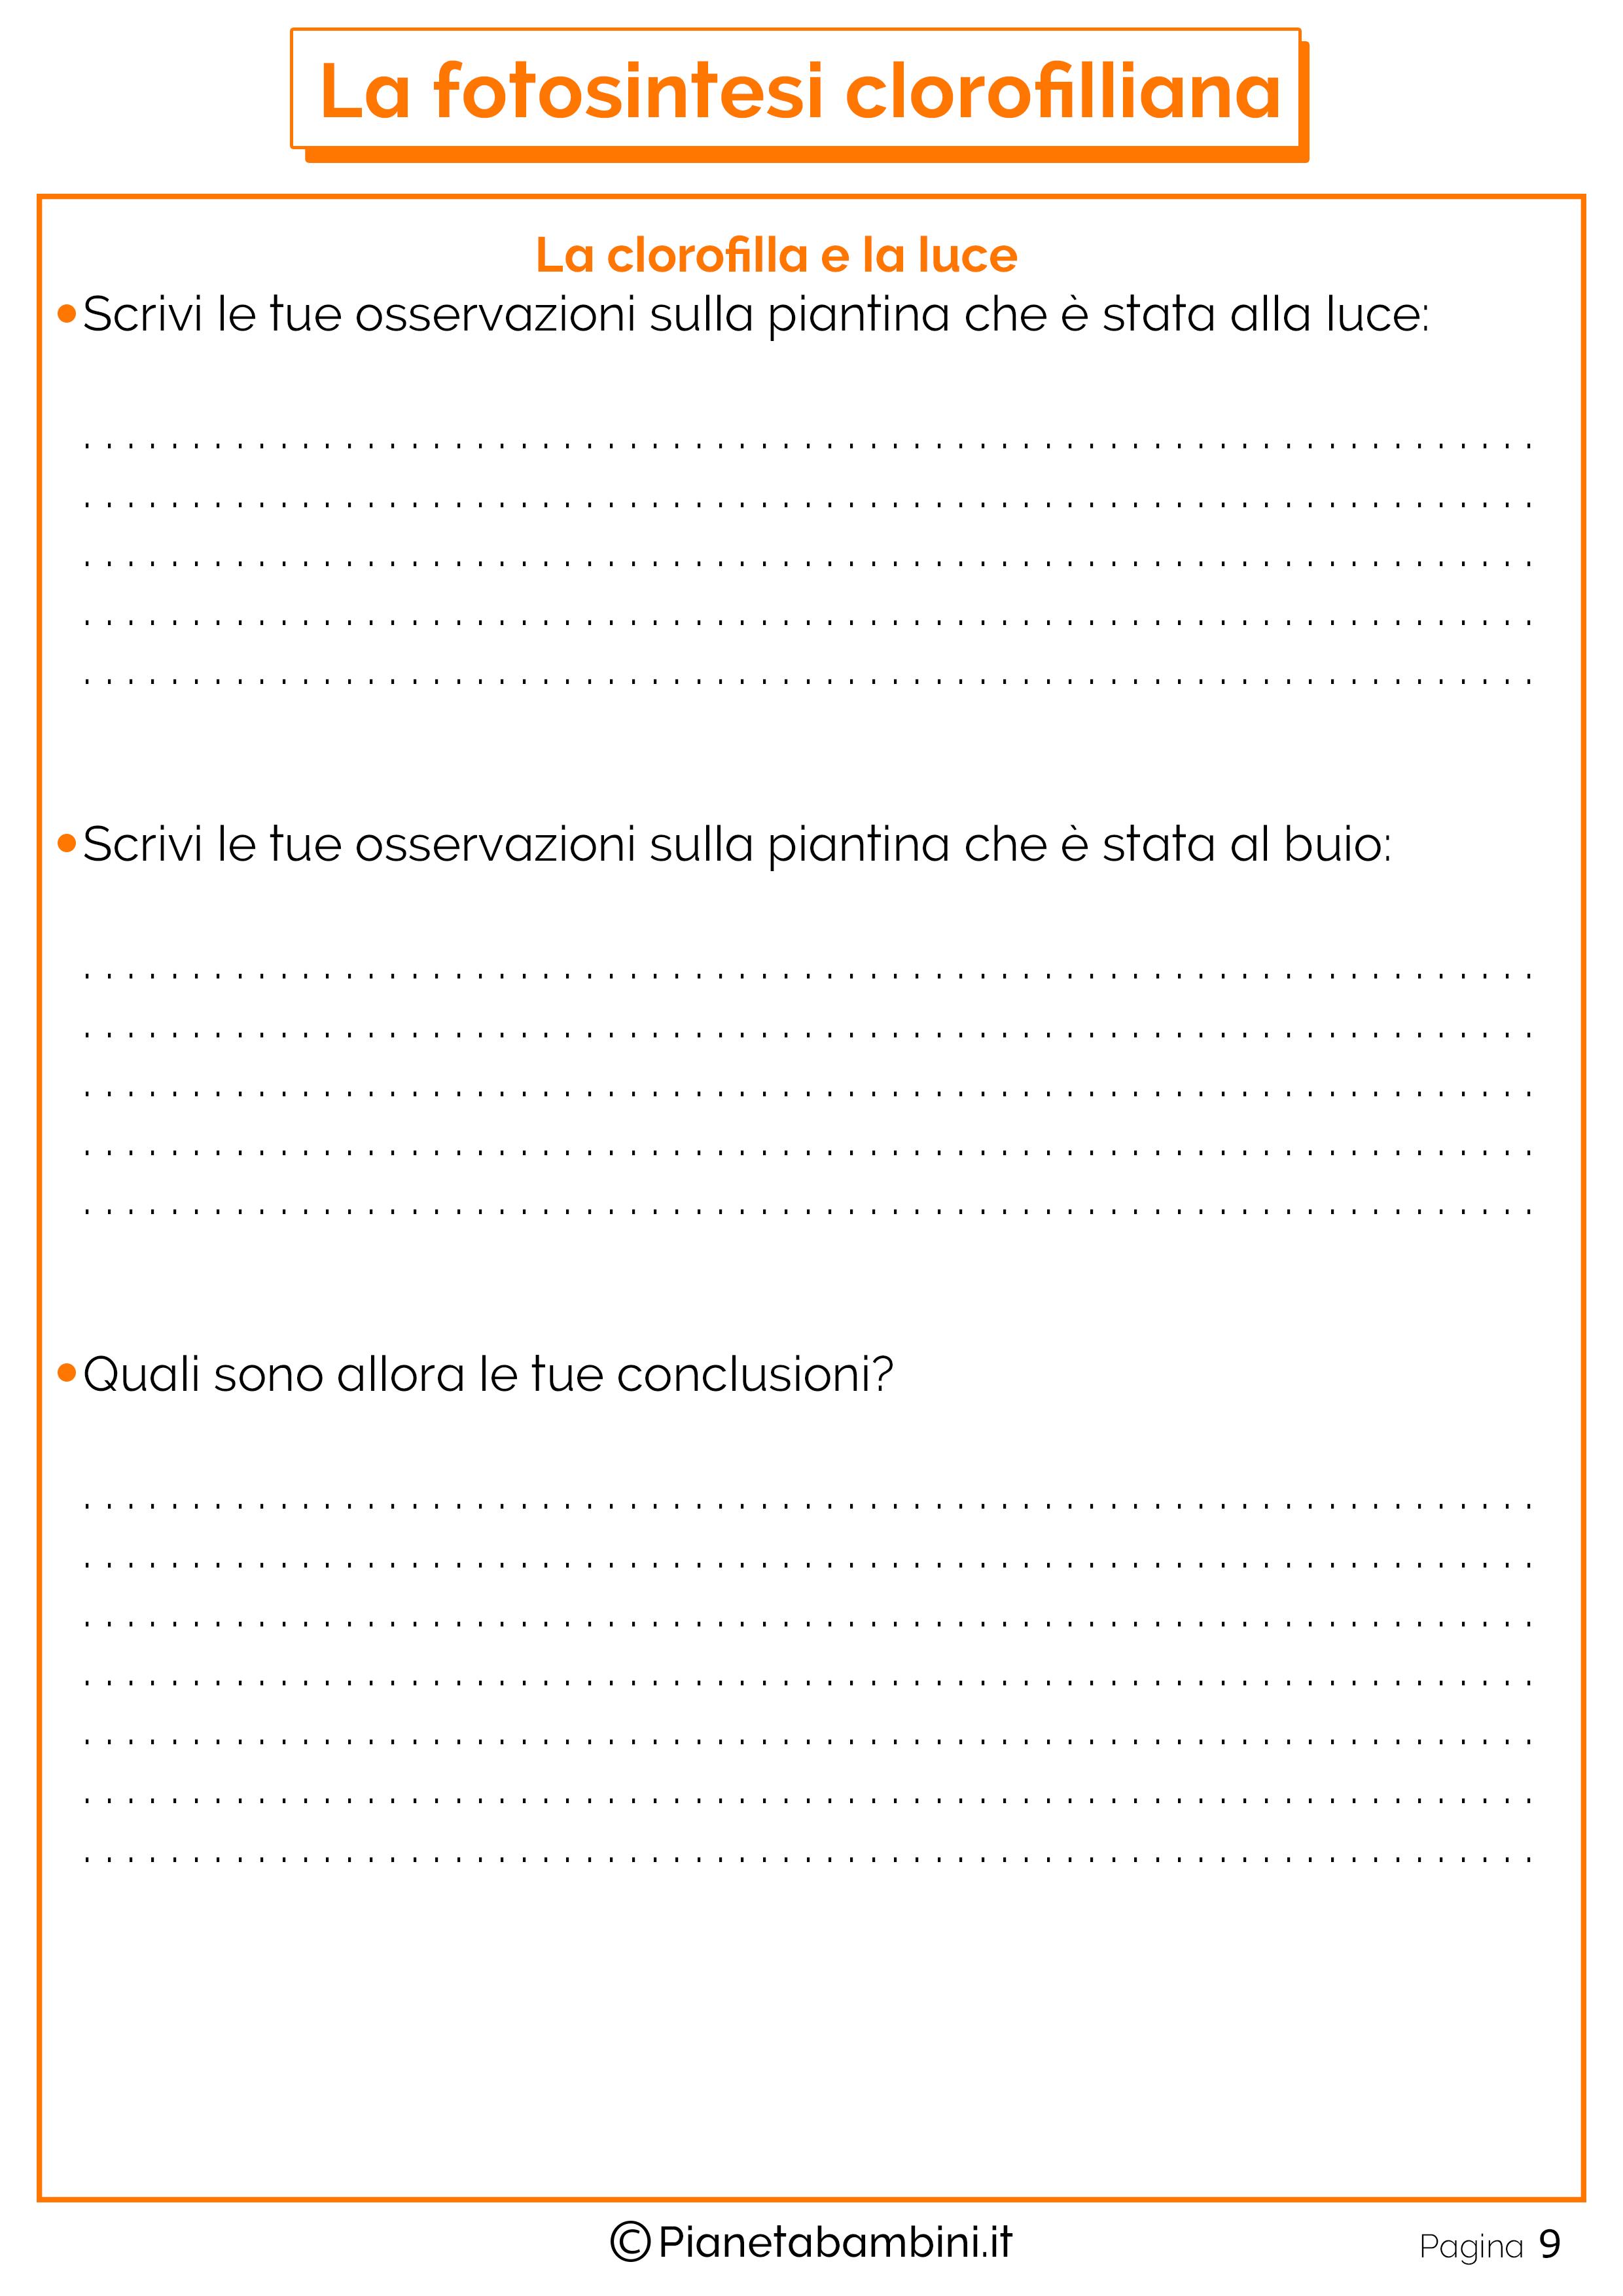 Schede-Didattiche-Fotosintesi-Clorofilliana-9